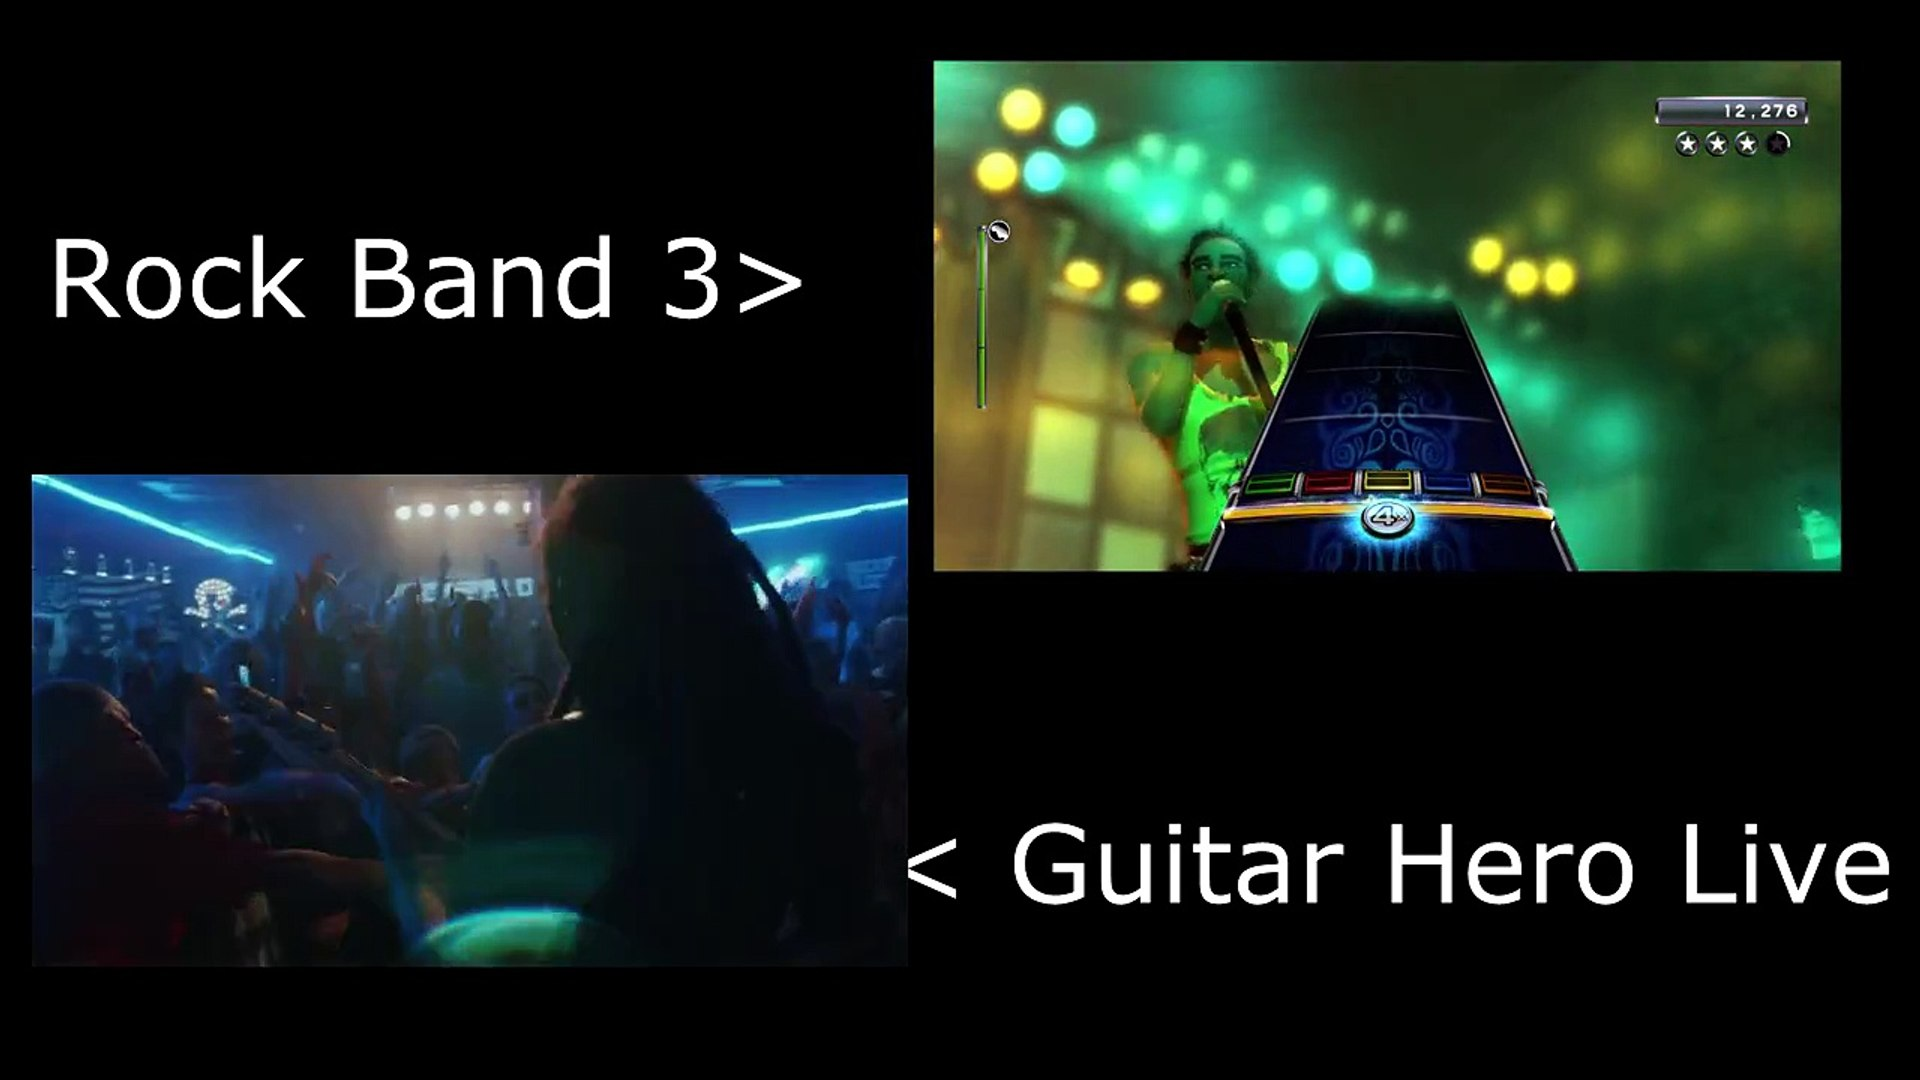 Rockband 3 Vs Guitar Hero Live R U Mine Video Dailymotion